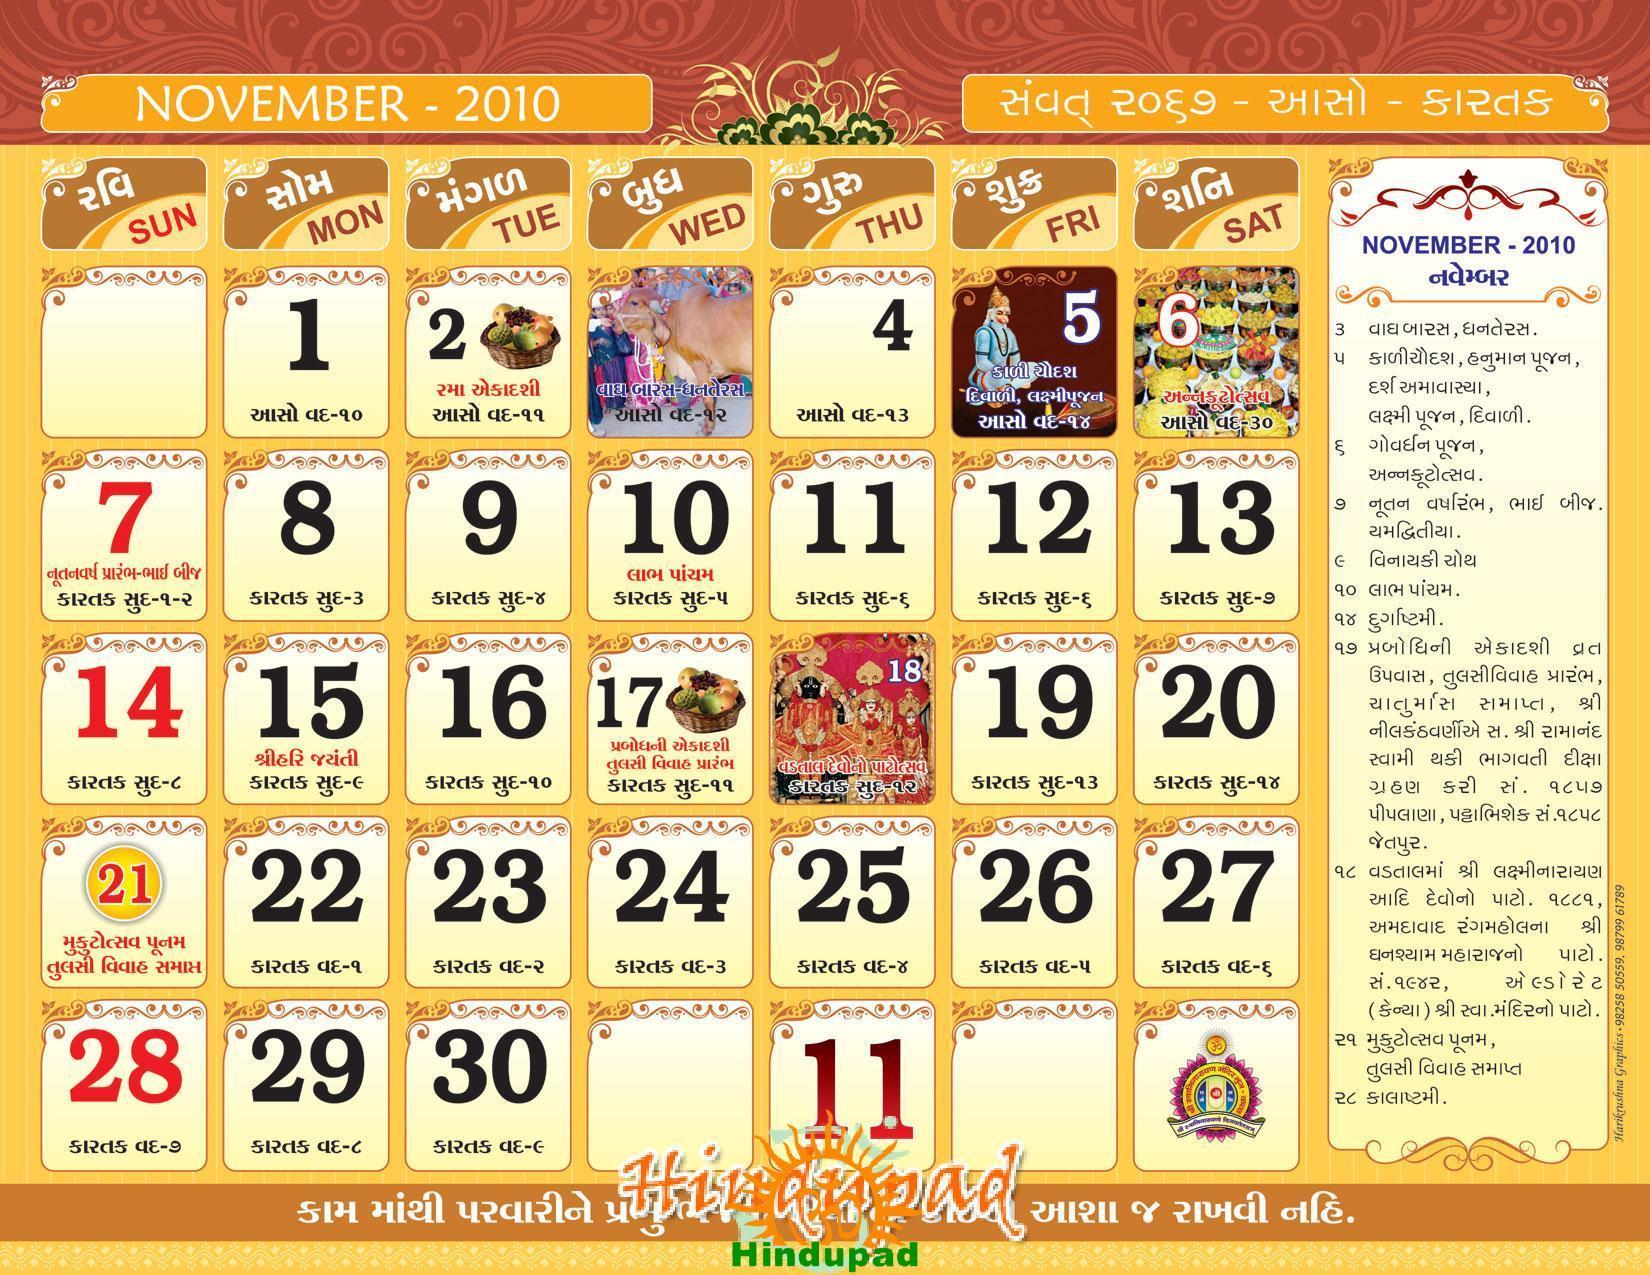 Gujarati Calendar November 2010 – Download Free Gujarati Calendar